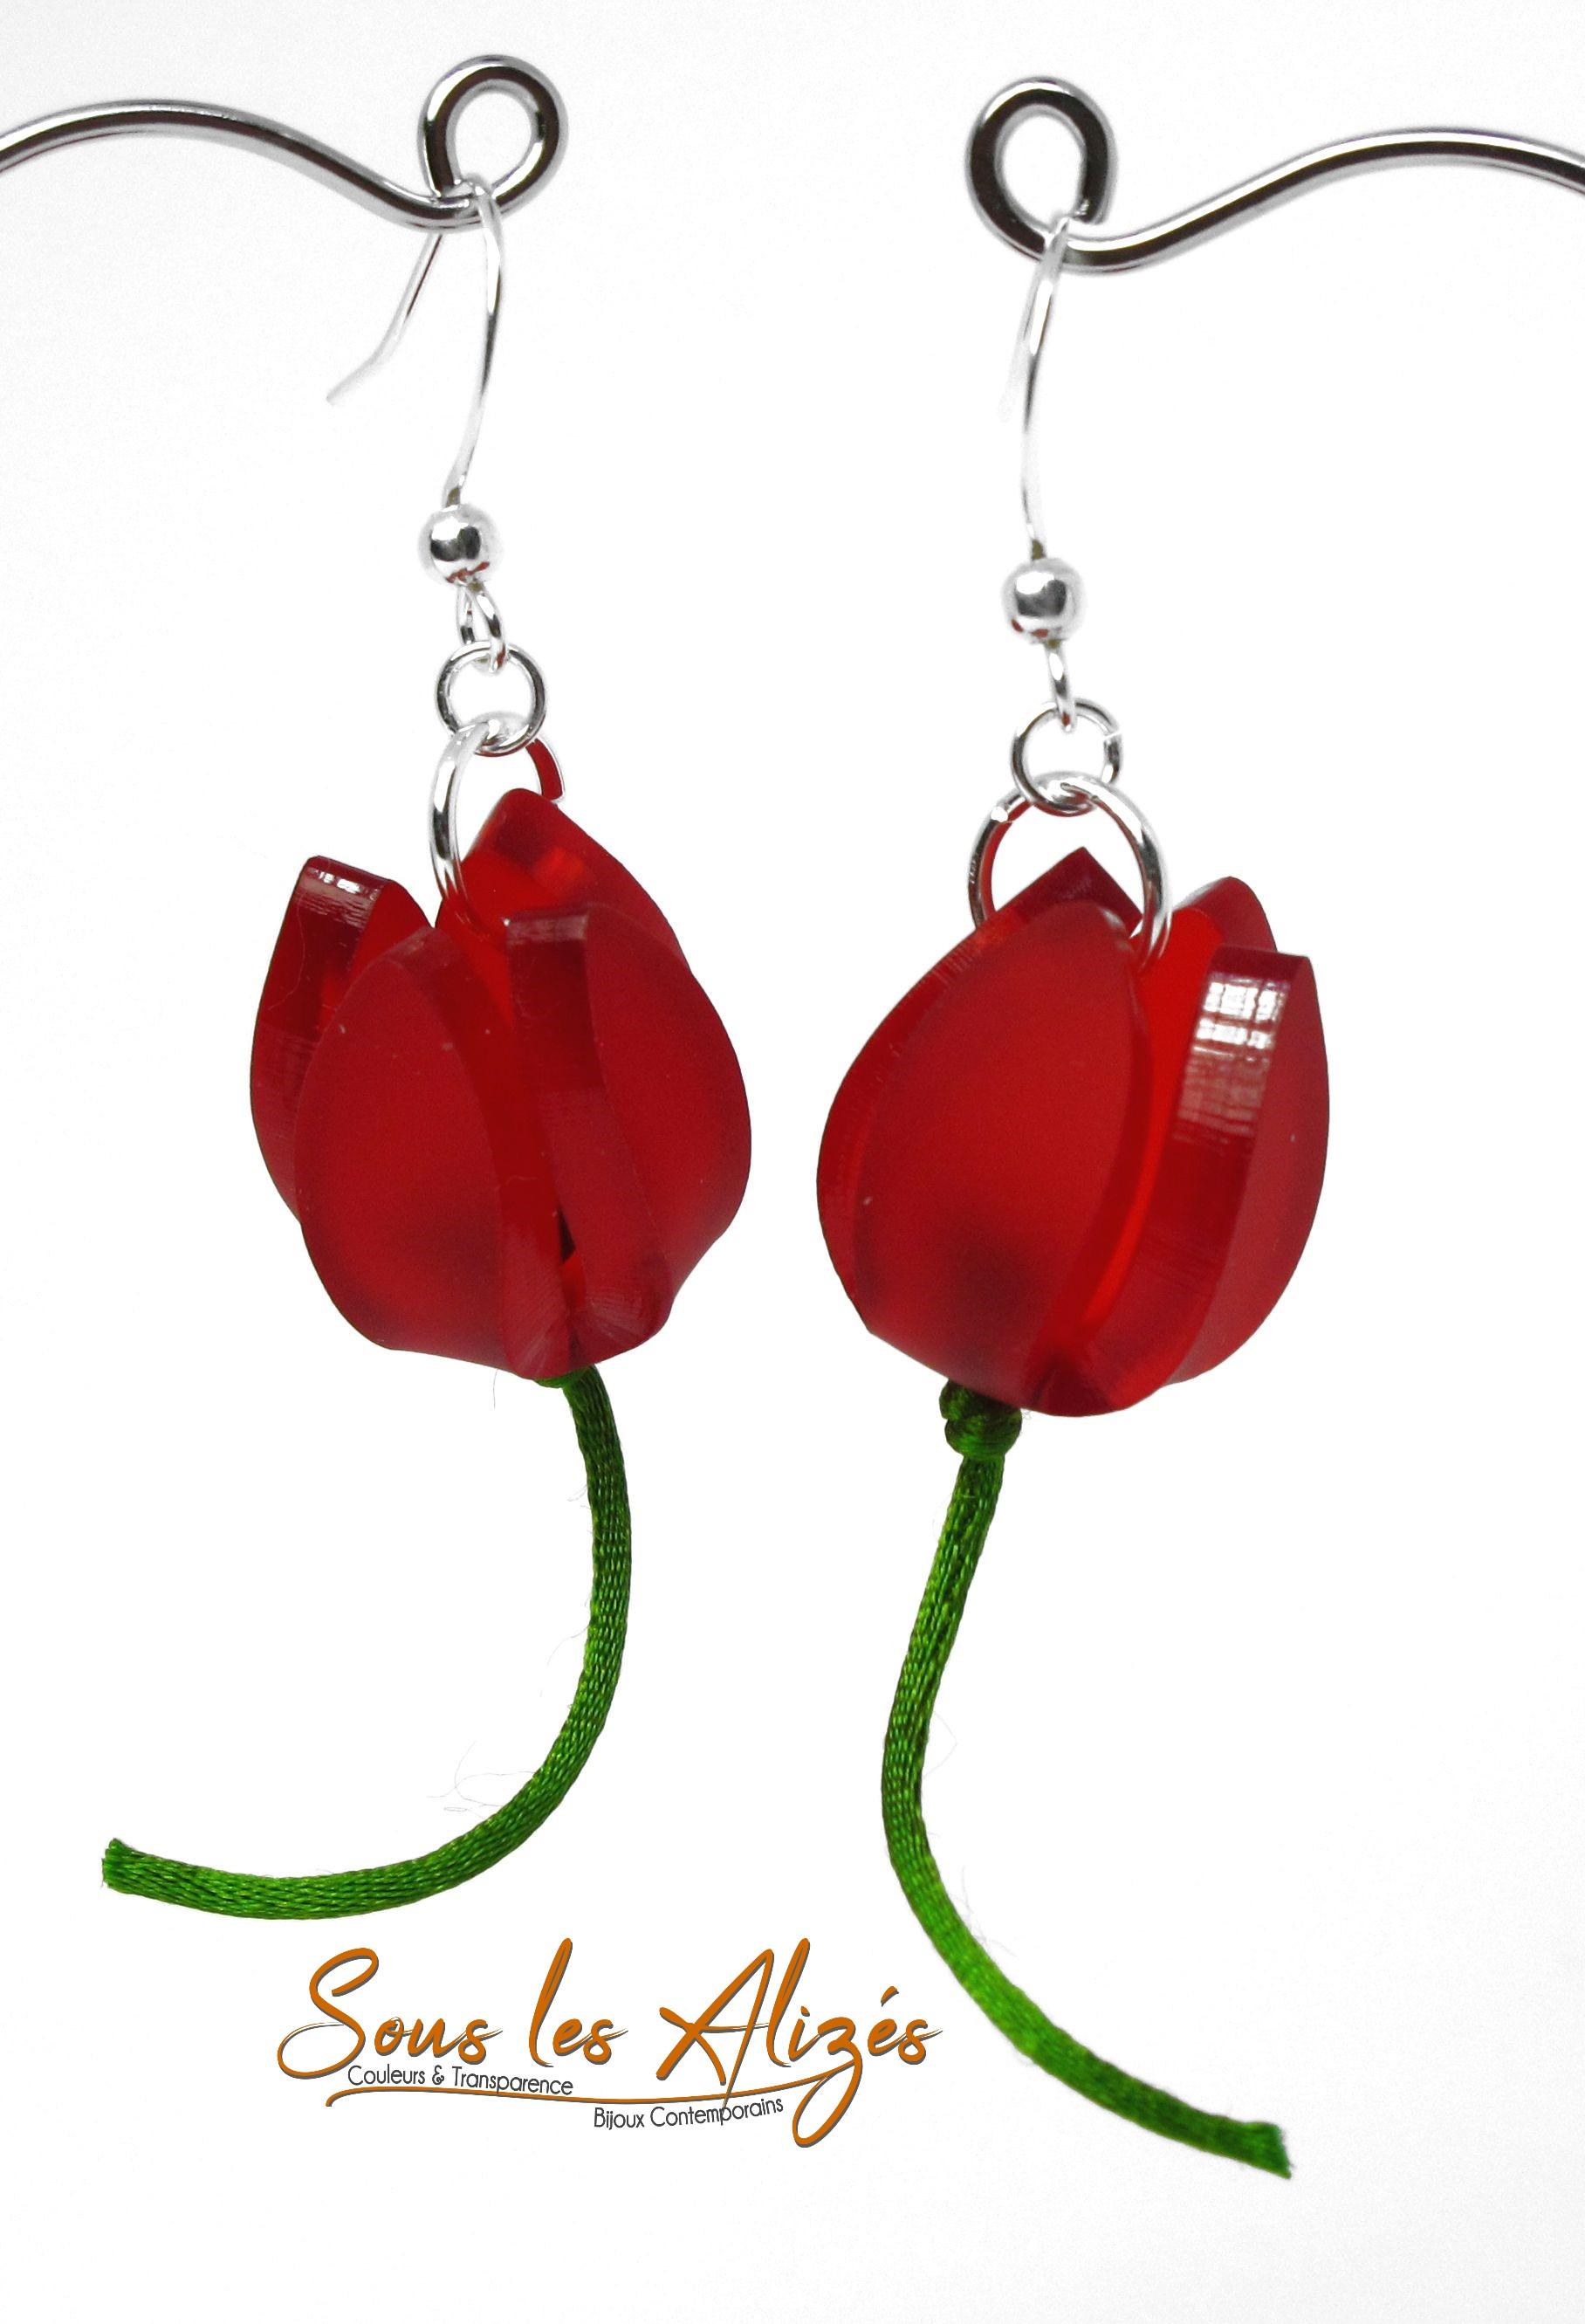 Tulipes Rou1362_Sous les alizes